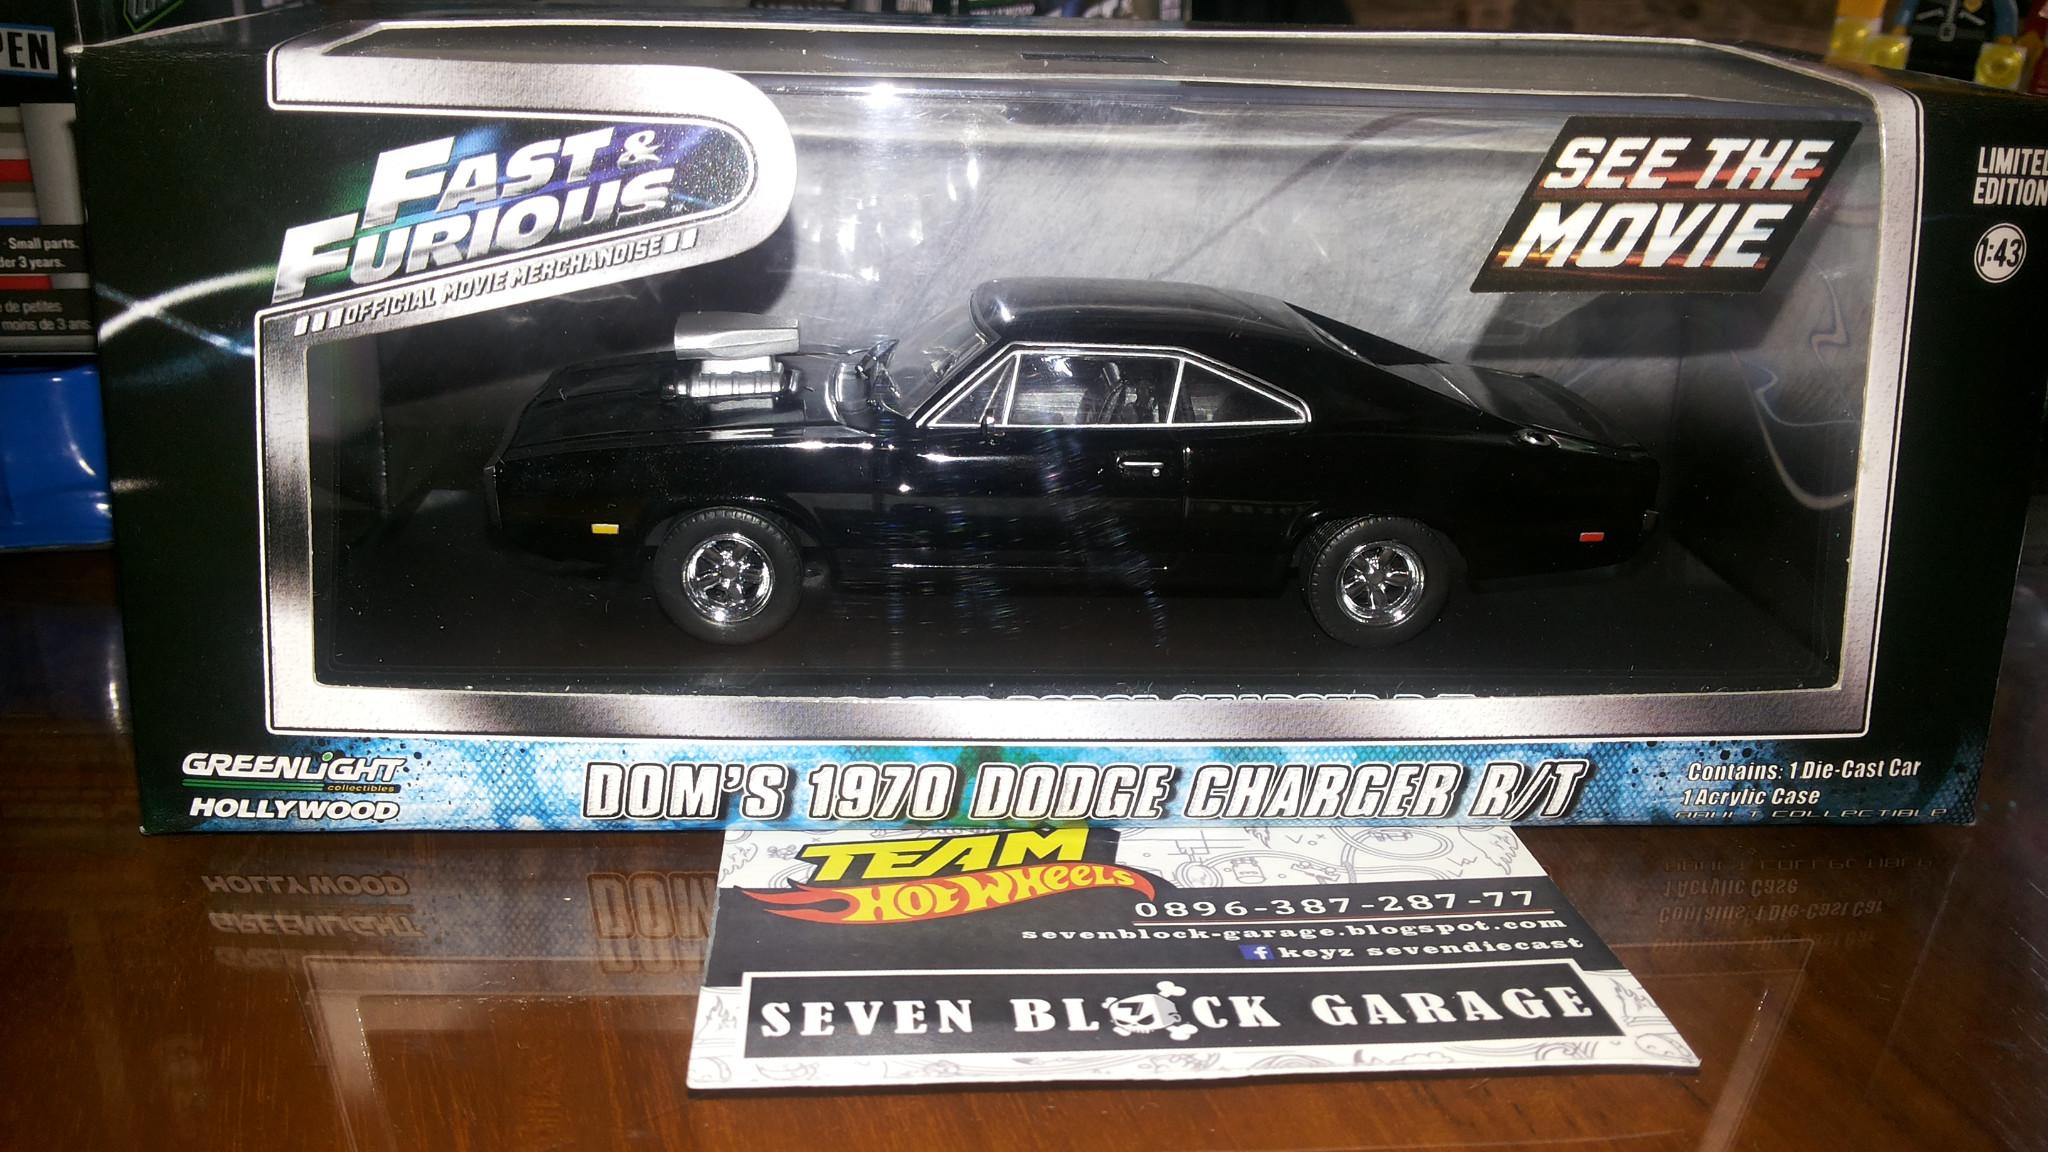 Jual Greenlight Dodg Charger Fast Furious Doms Car Seven Block